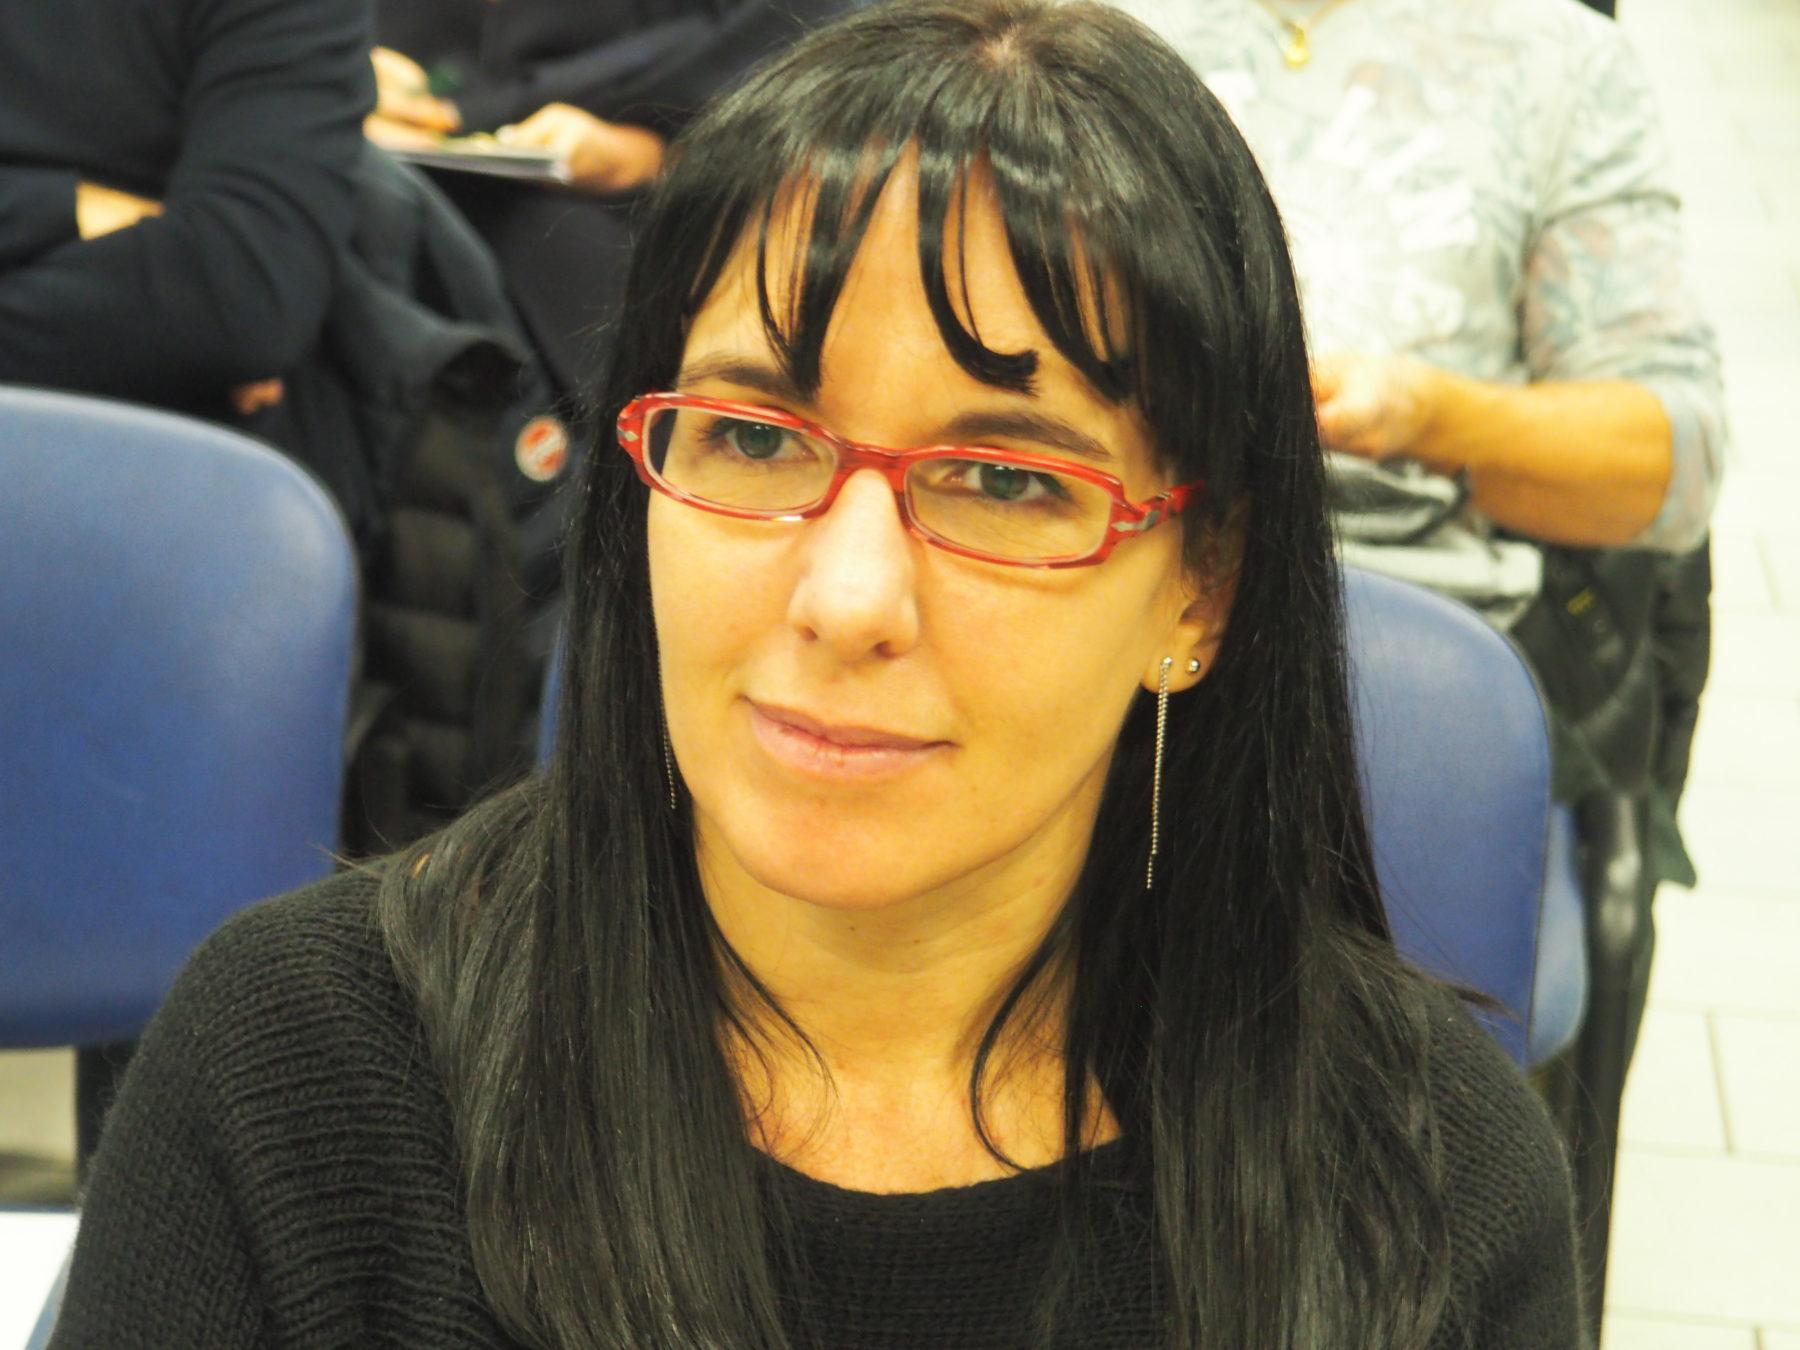 Cristina Maccari